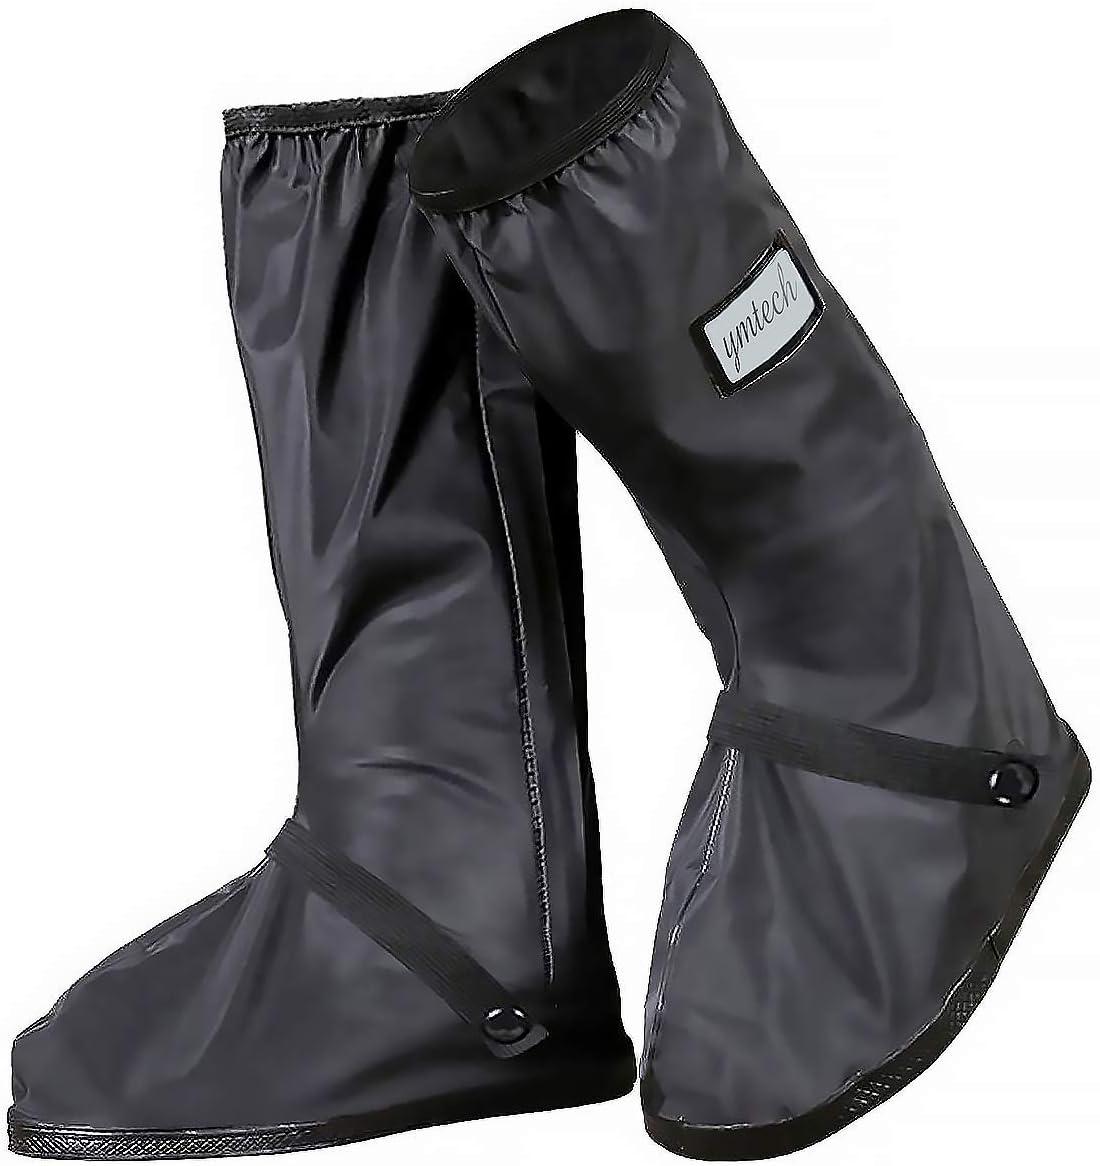 YMTECH Impermeable y antideslizante Cubierta del zapato